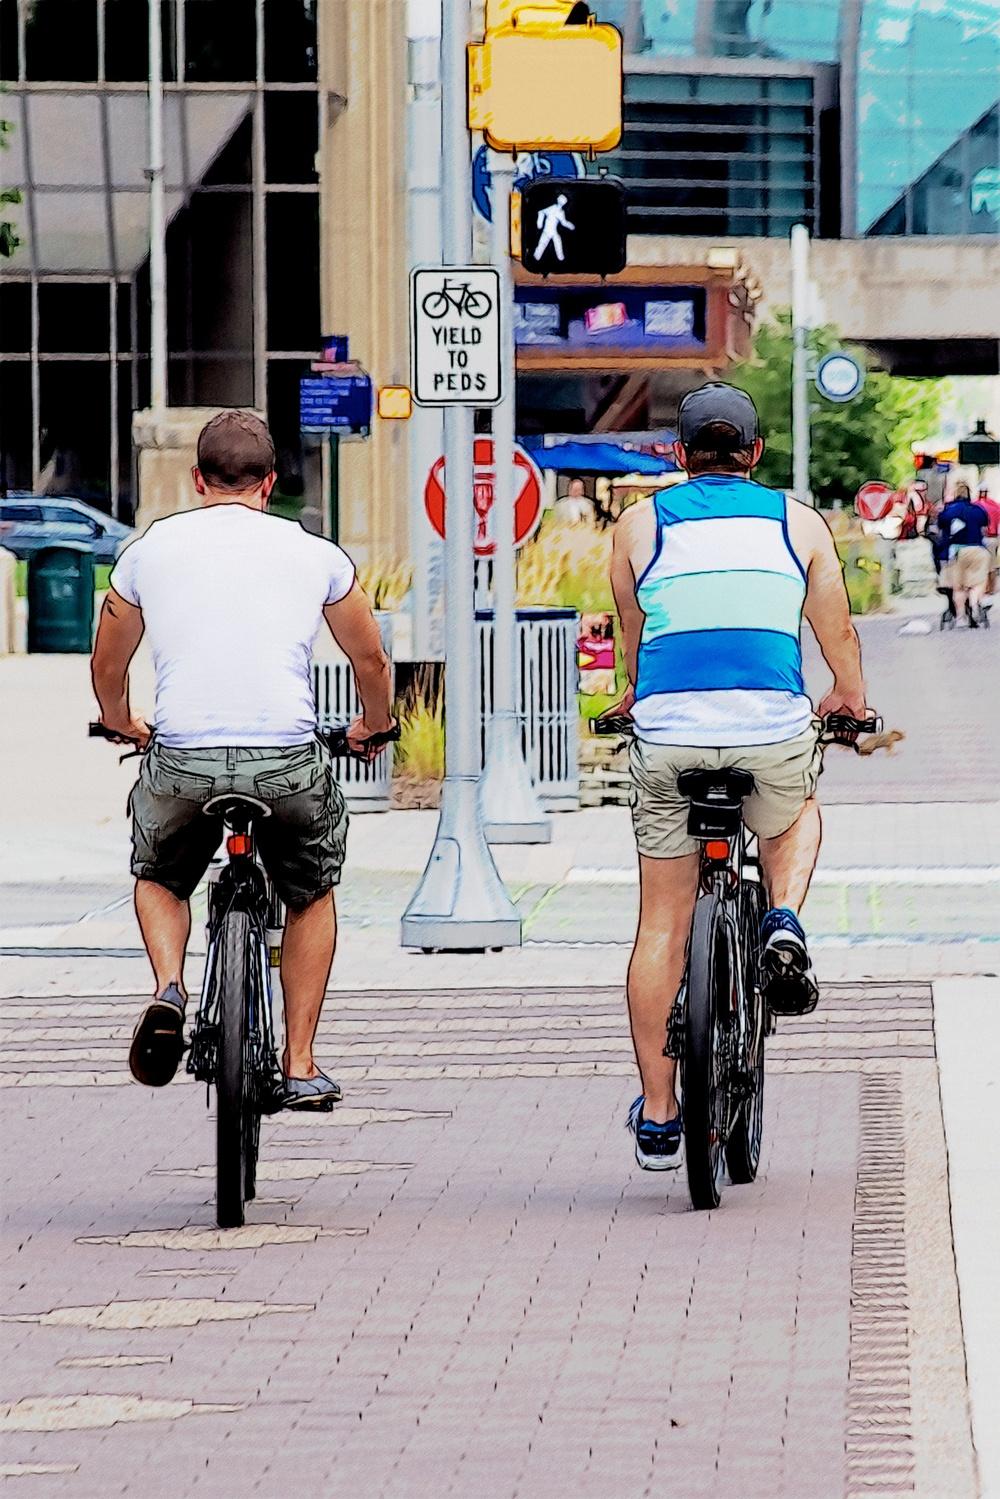 2 cyclists?